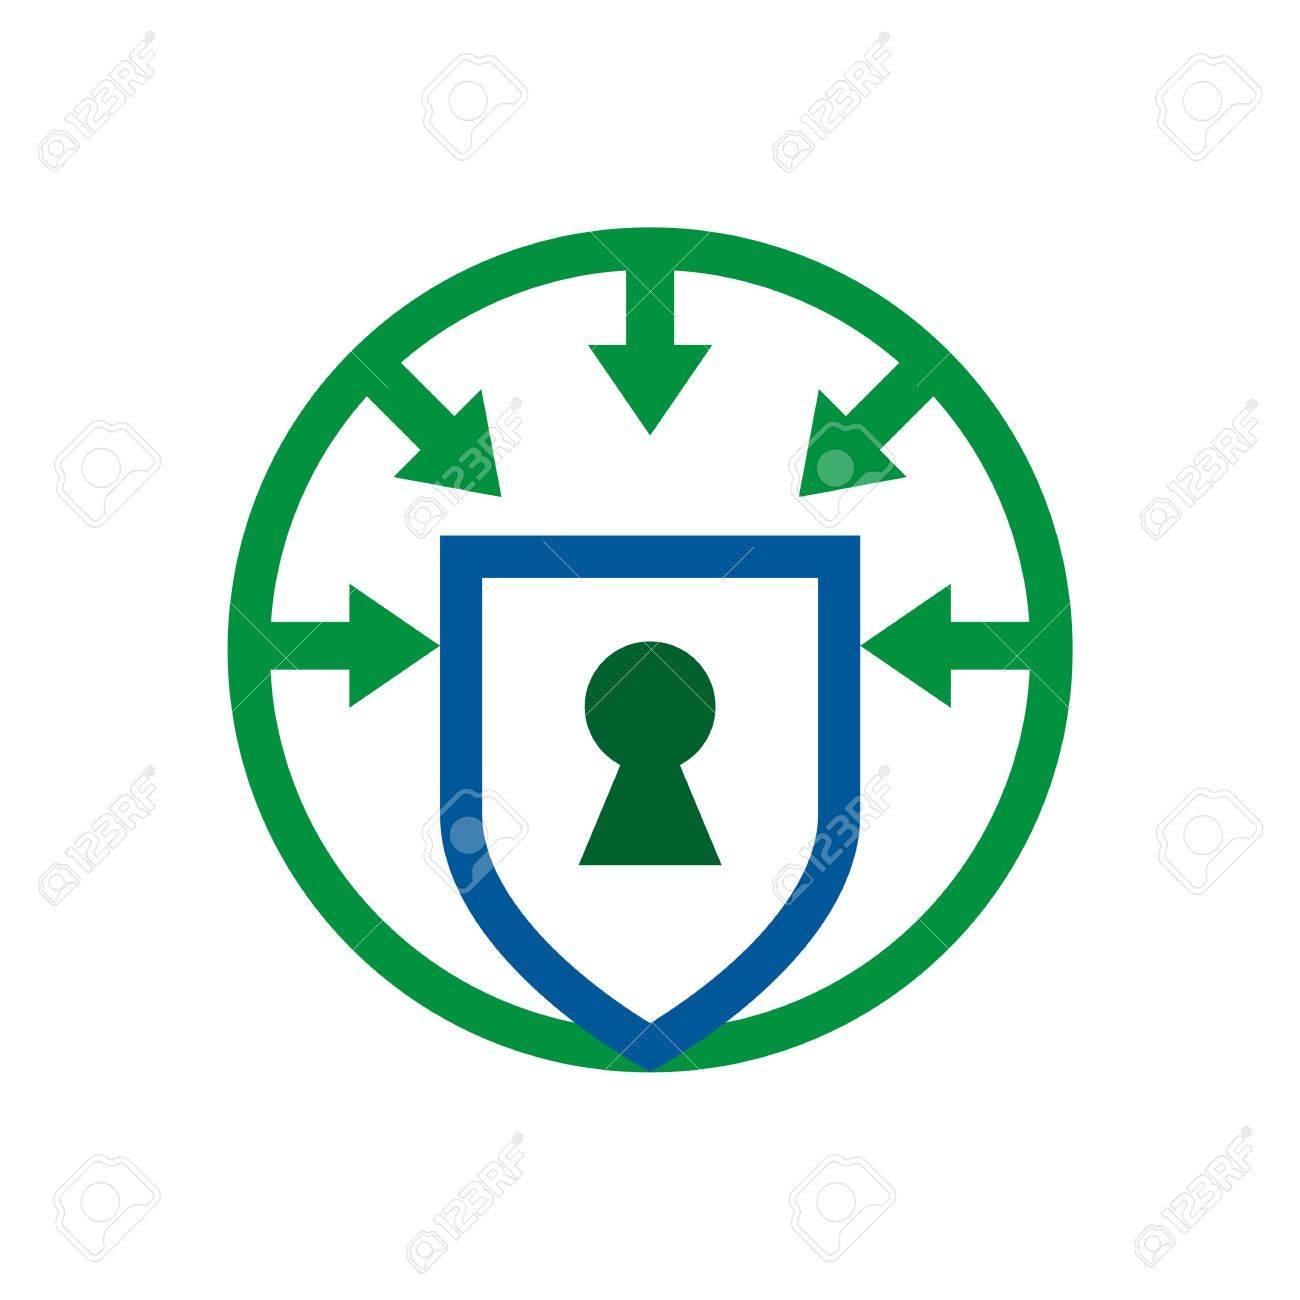 Security Shield Symbol Icon Circle Logo Protection Royalty Free